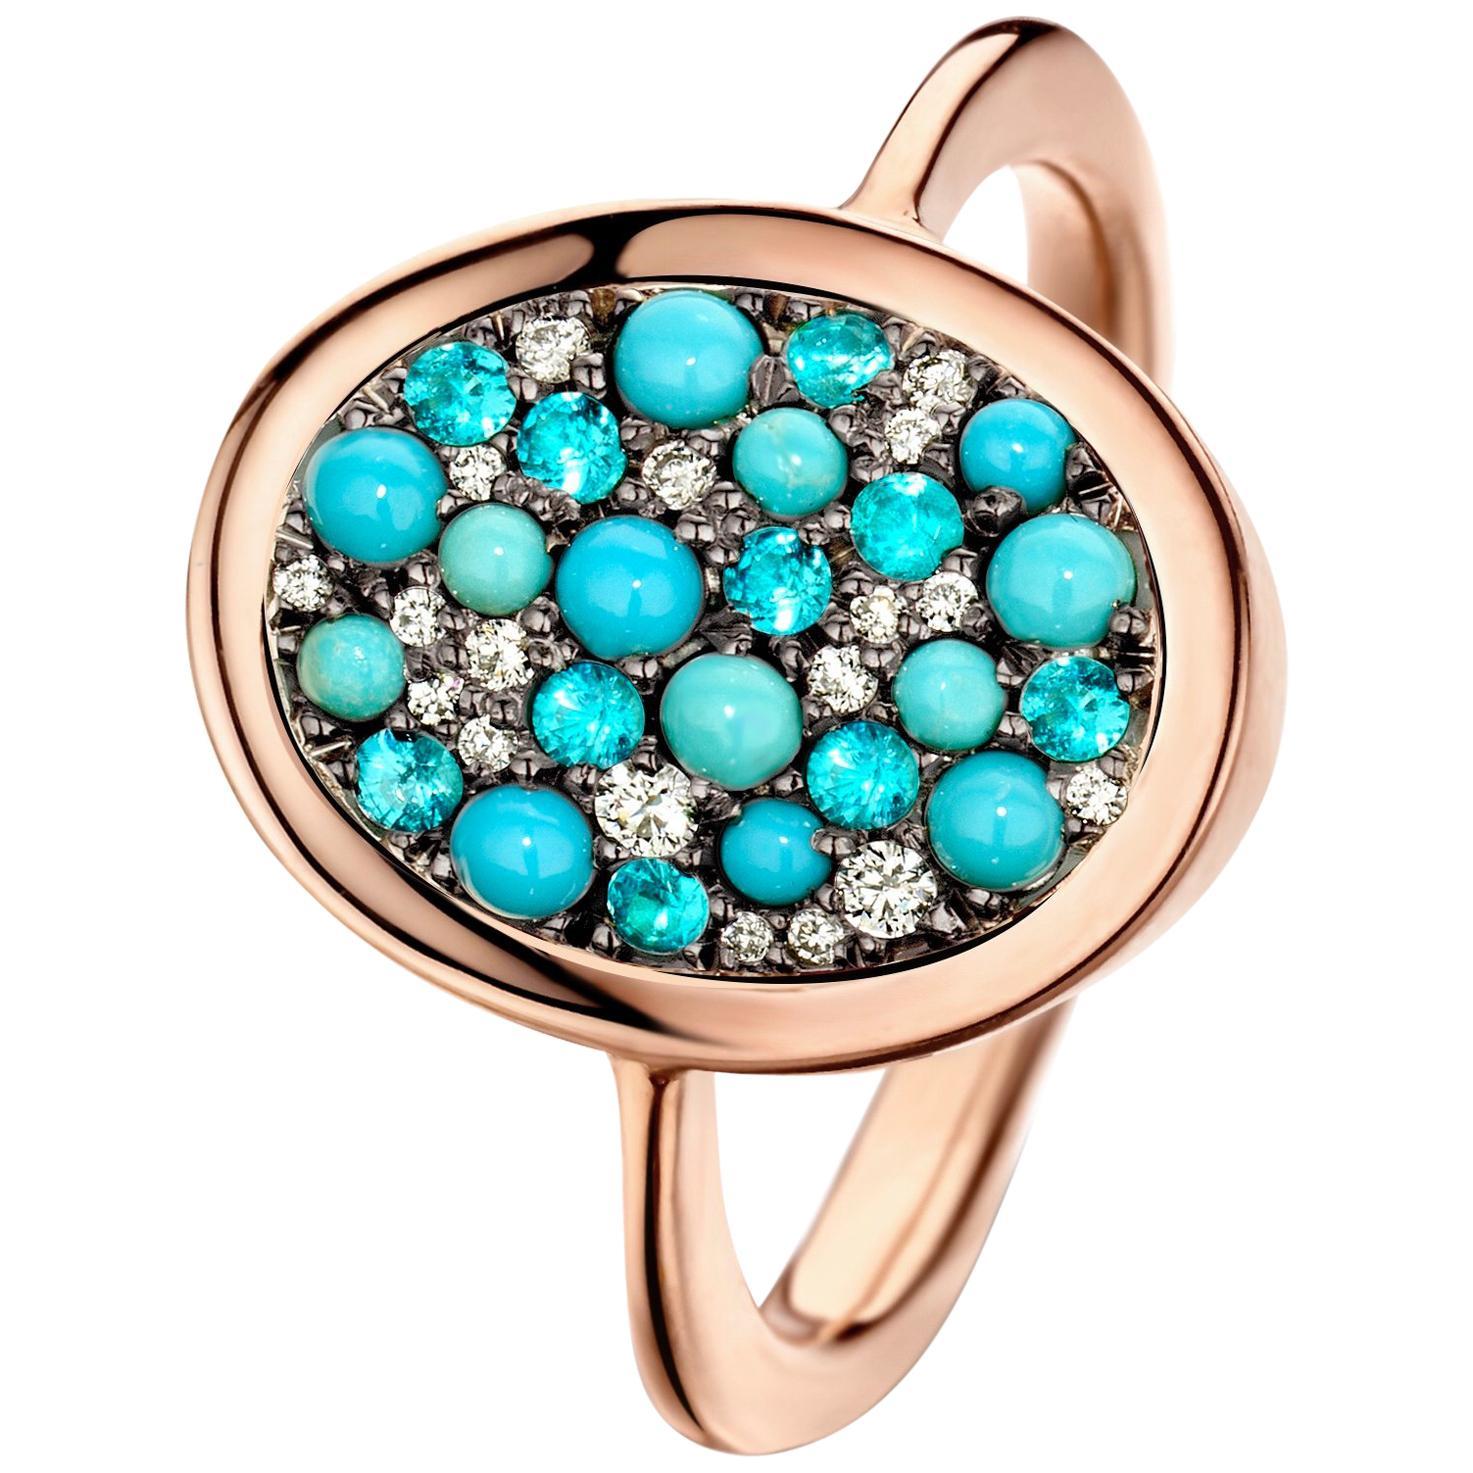 Joke Quick Turquoise, Paraïba tourmalines & Diamond ring